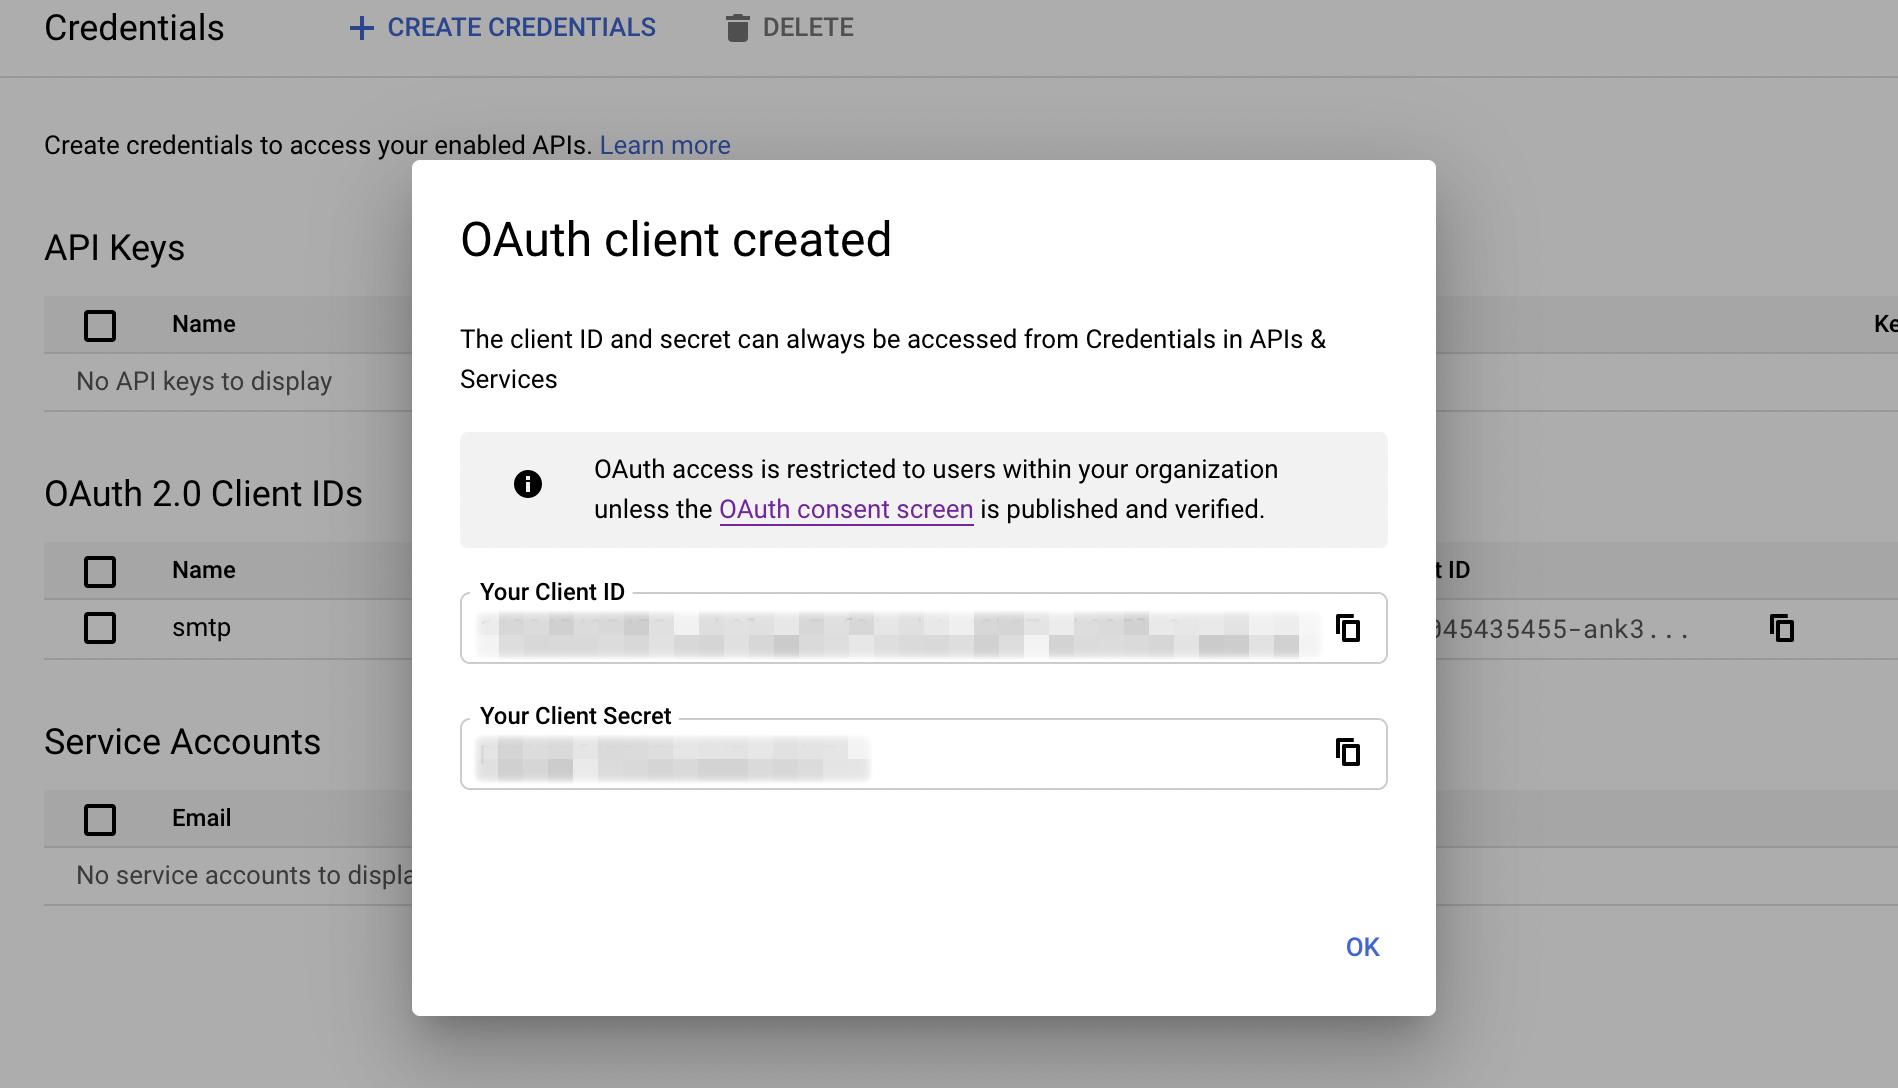 oauth-client-key-and-secret-579c1bced83ff0ac5b33d252.png